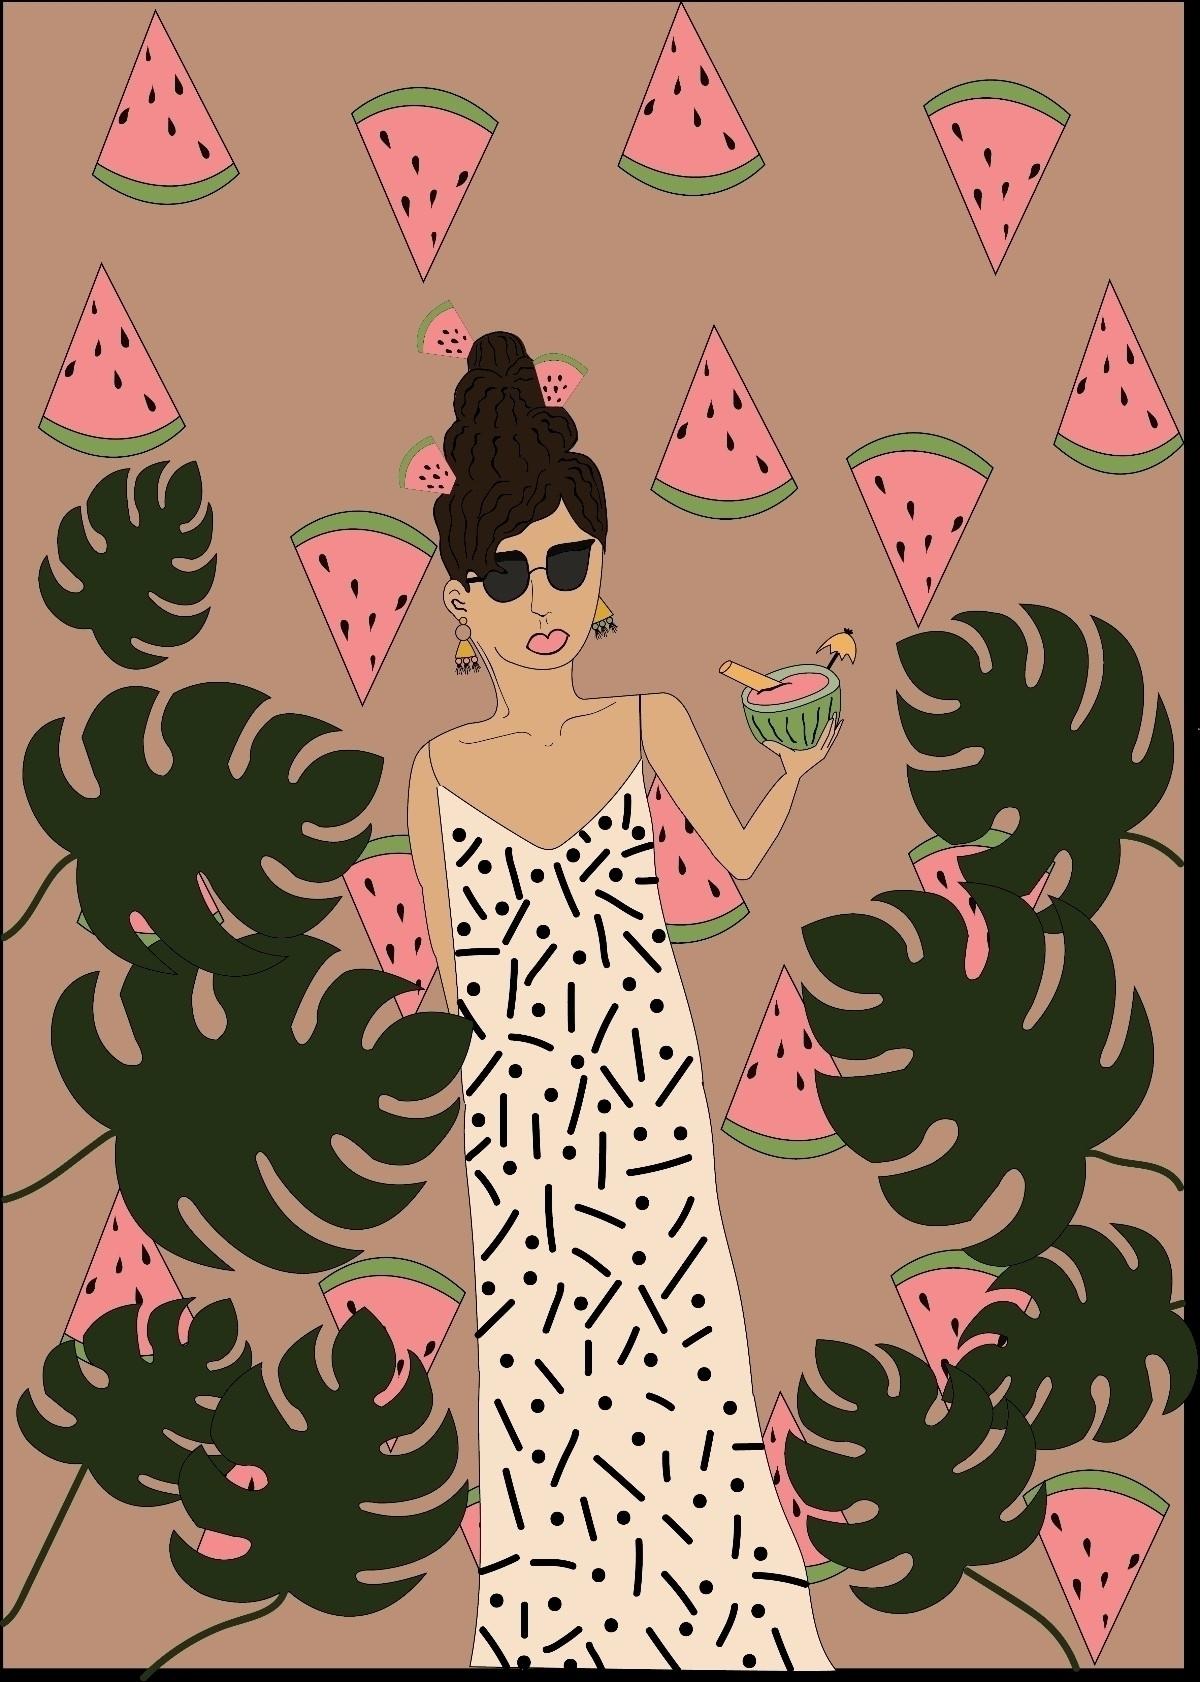 watermelon, girl, woman, plant - efstathia_ | ello